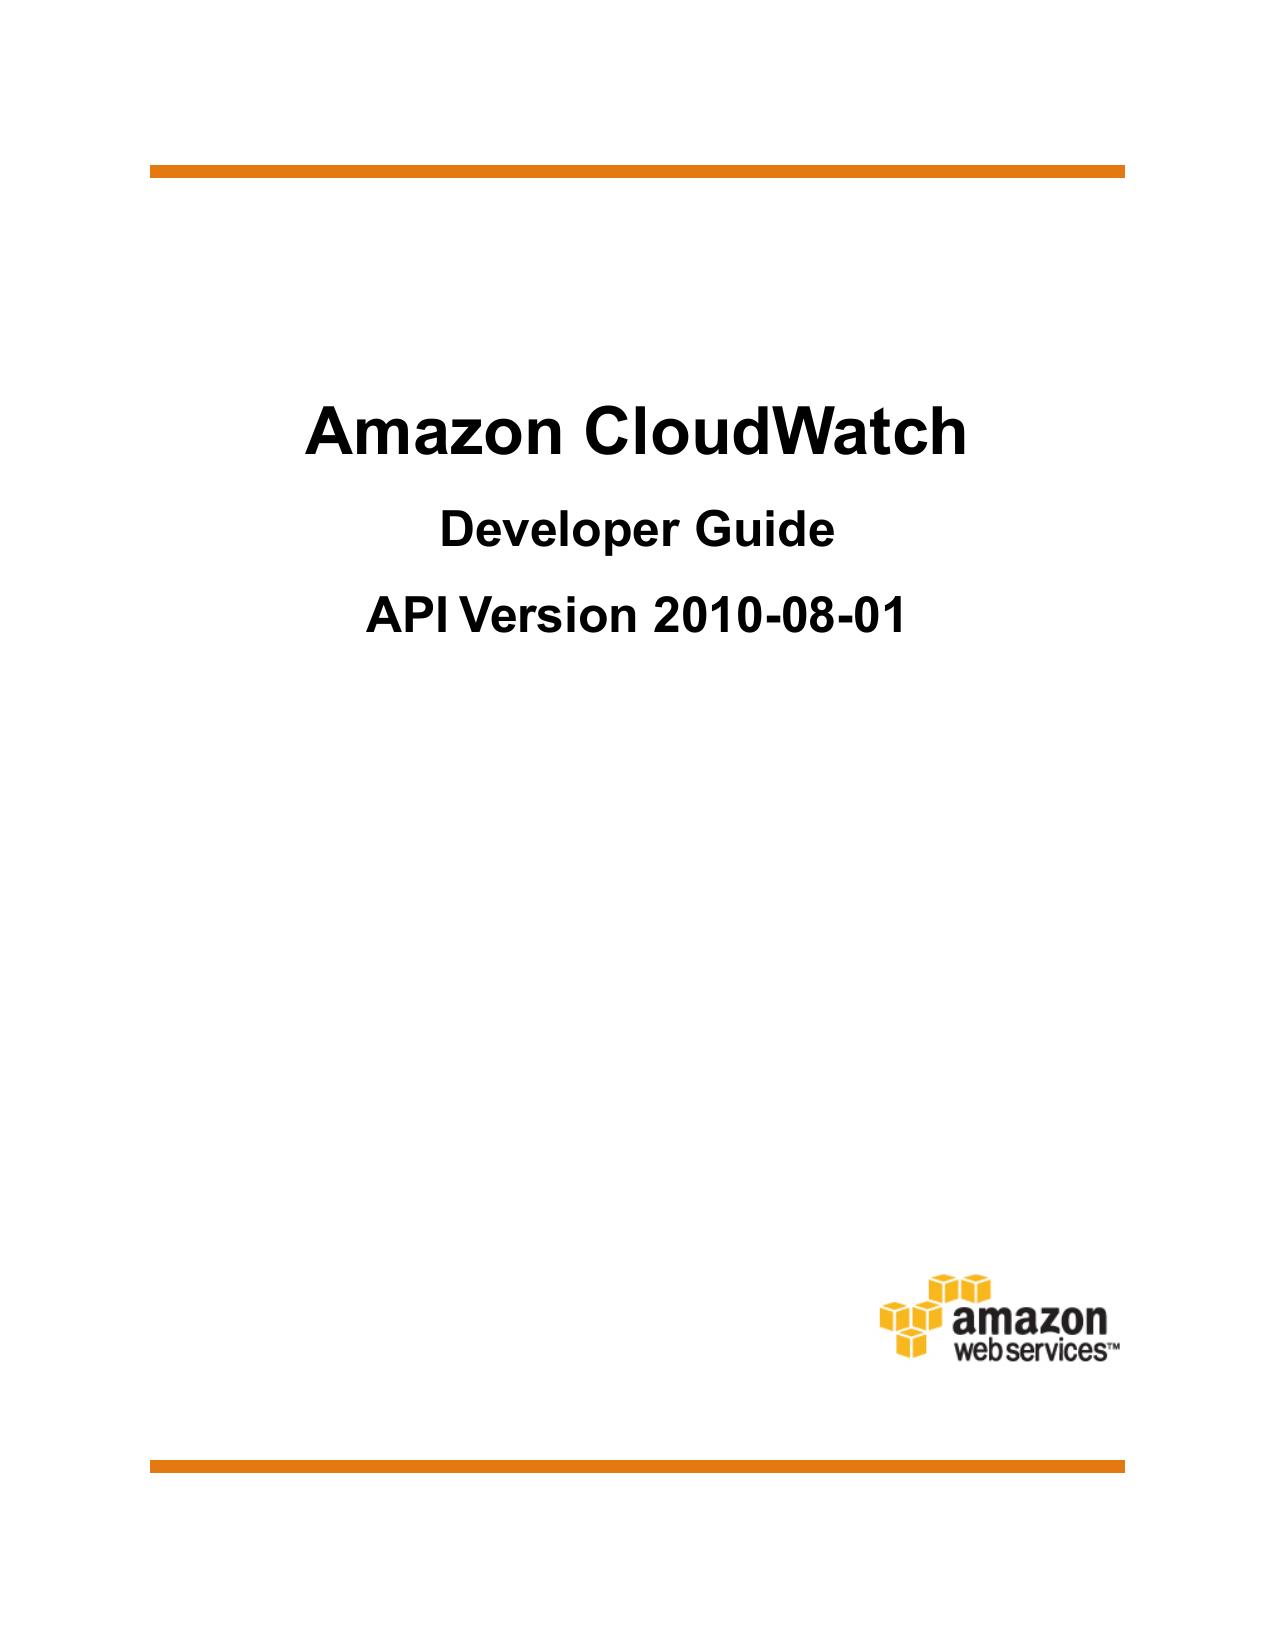 Amazon CloudWatch Developer Guide   manualzz com